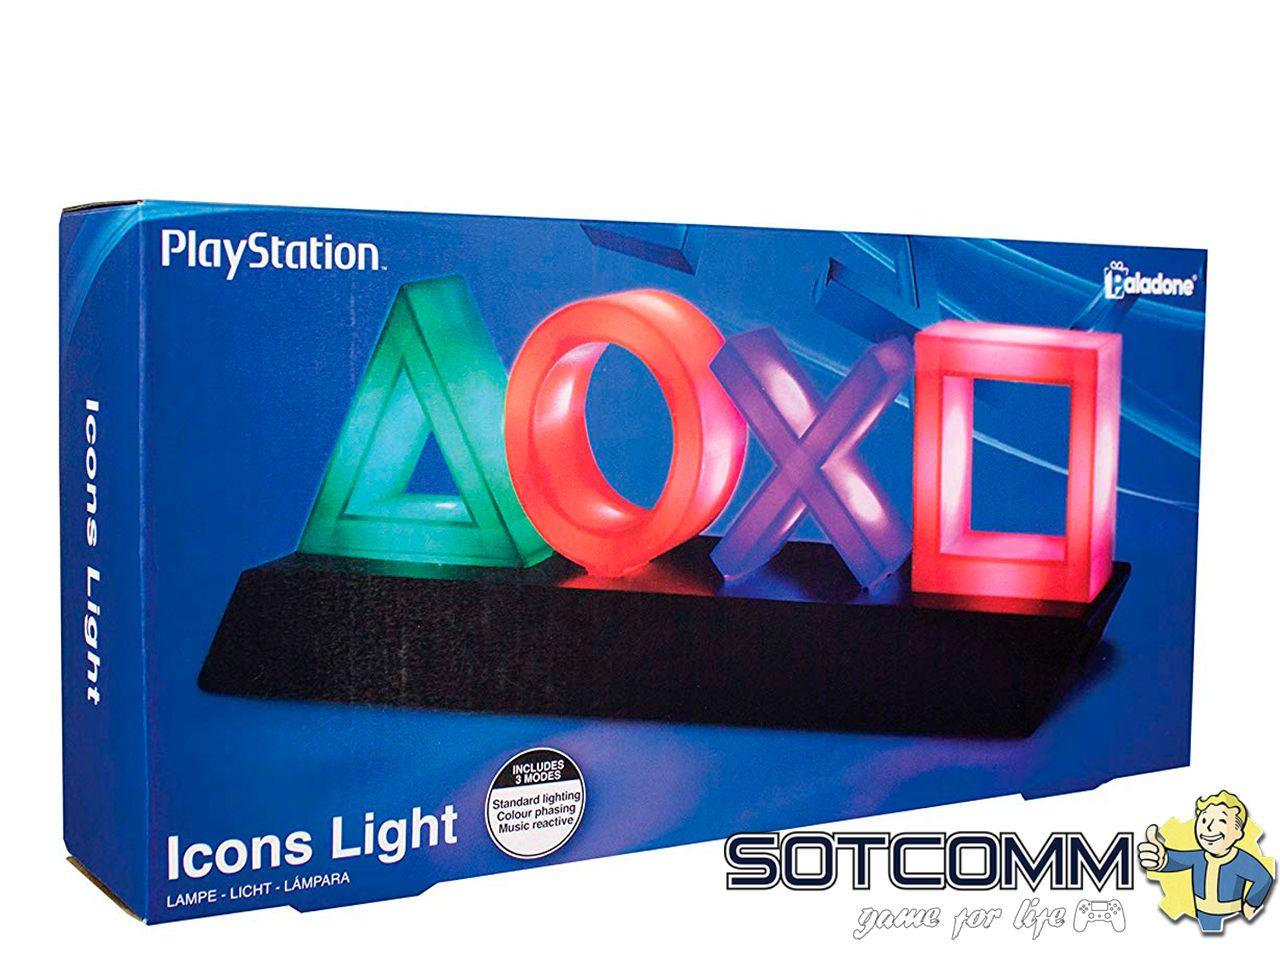 Геймерская лампа The PlayStation: Icons Light